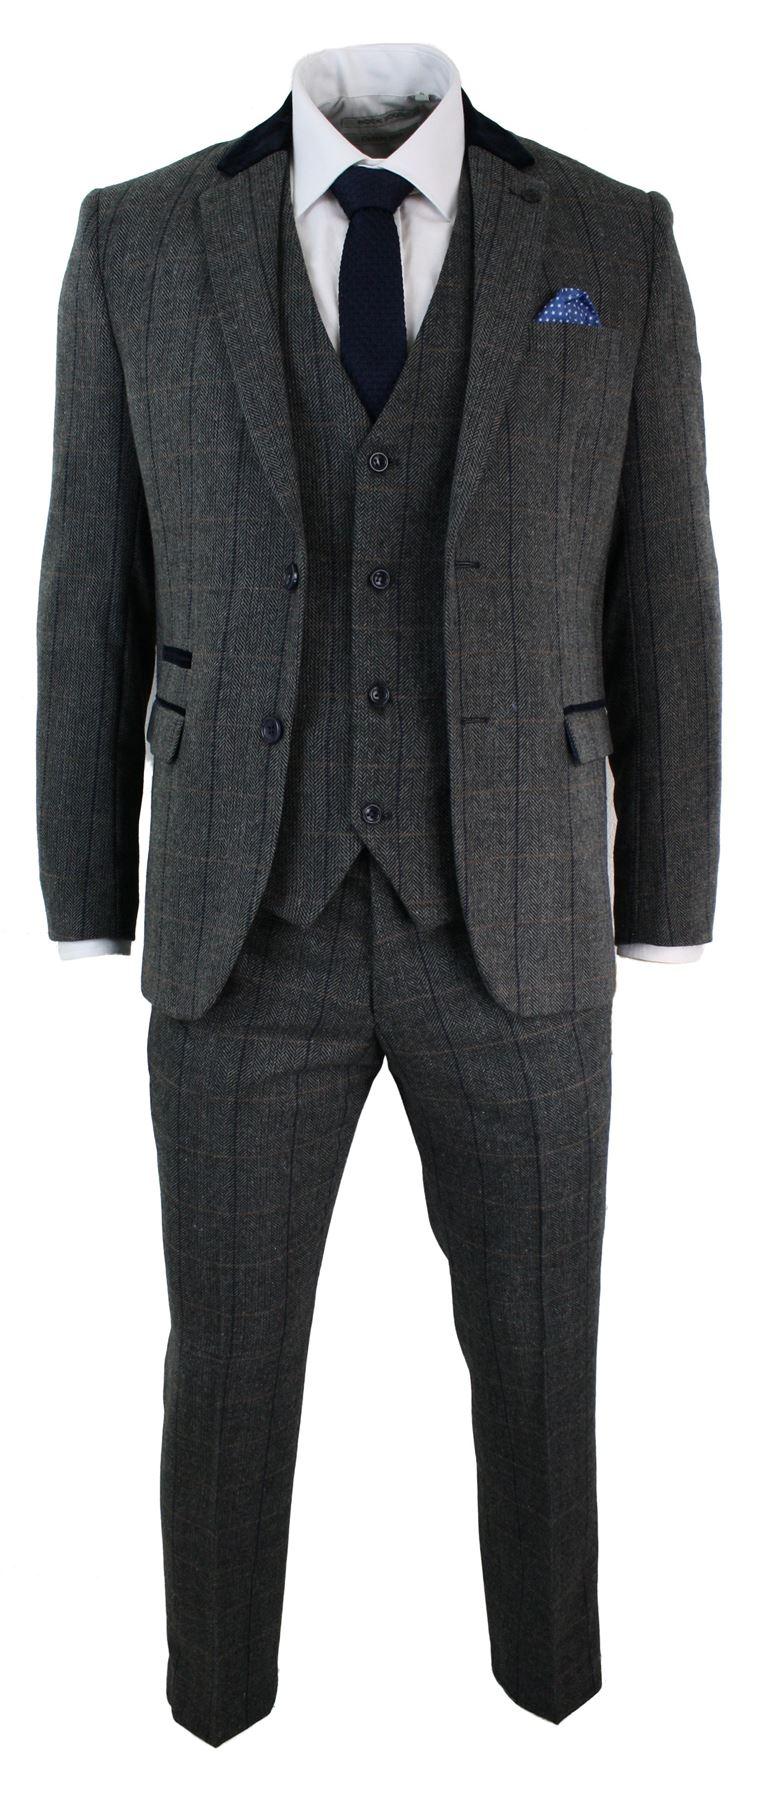 costume 3 pi ces homme tweed chevrons gris anthracite coupe ceintr e vintage ebay. Black Bedroom Furniture Sets. Home Design Ideas